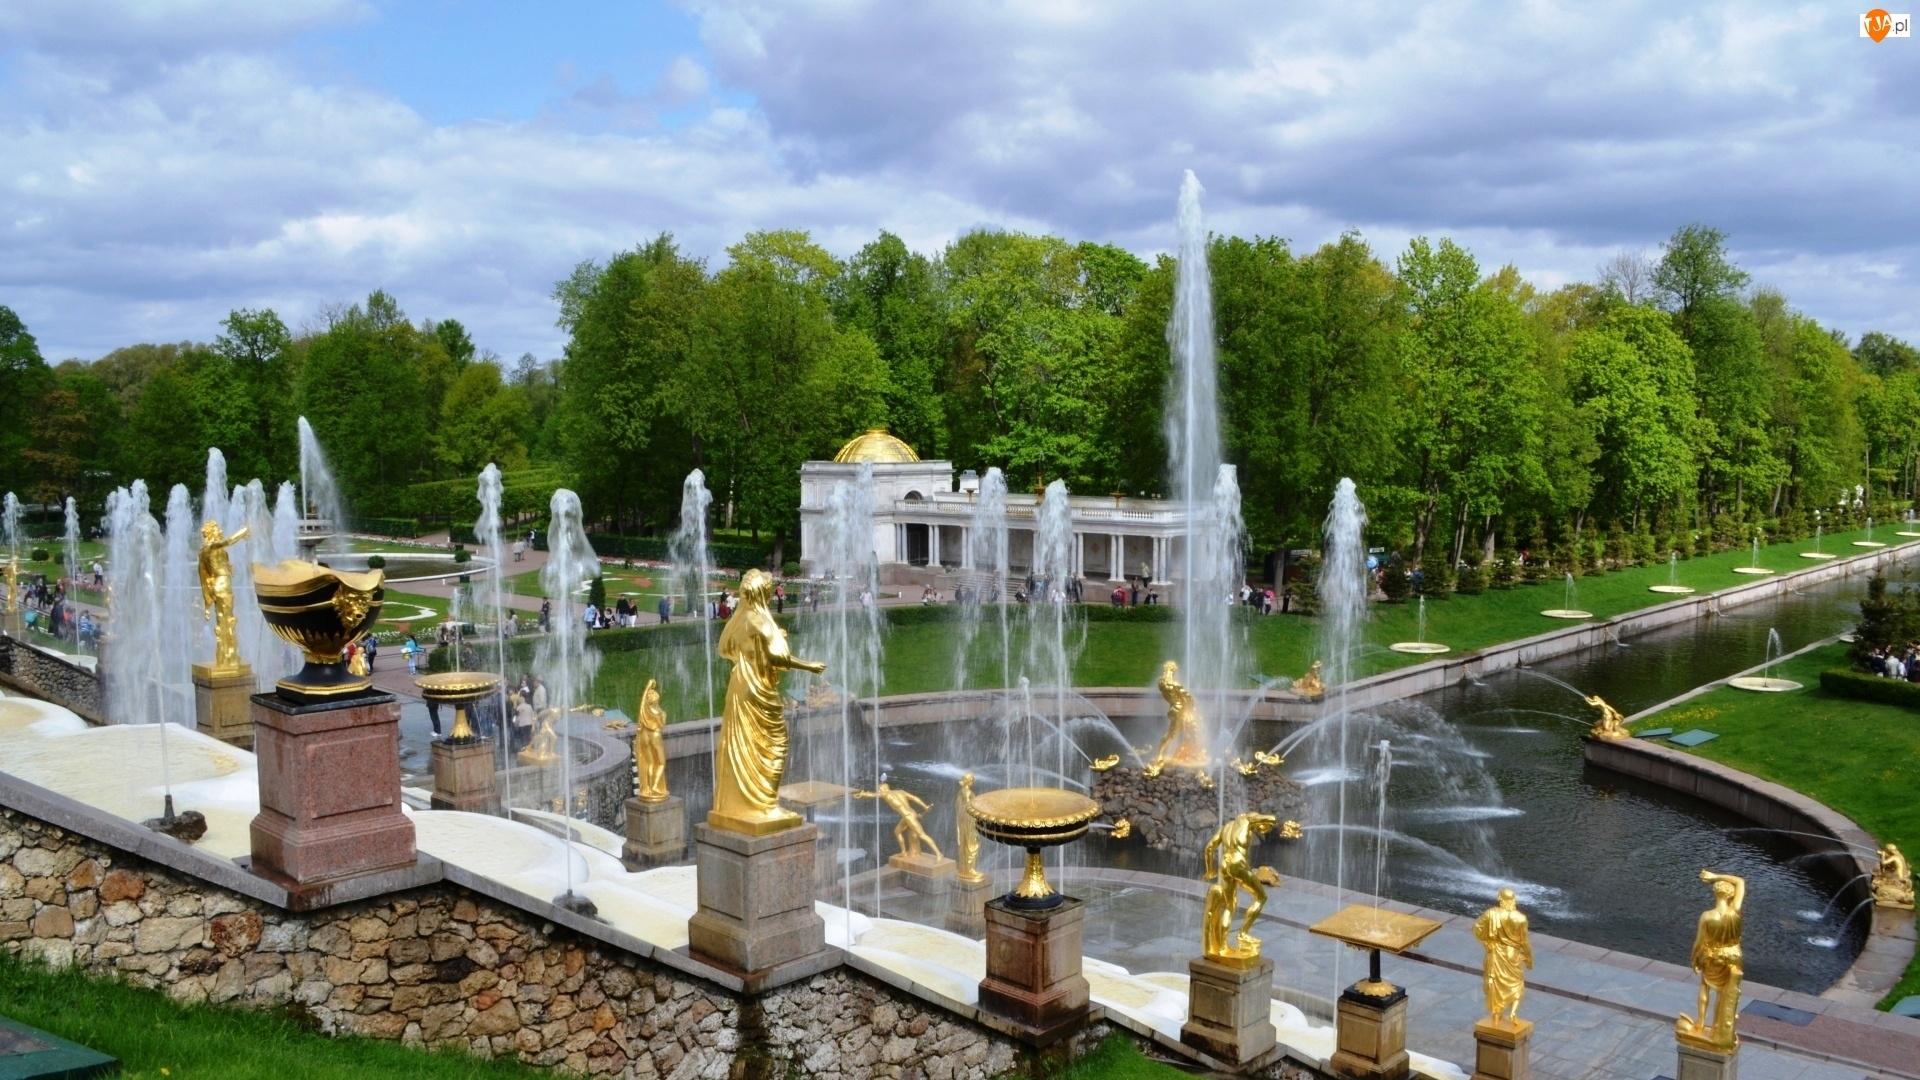 Park, Rosja, Fontanny, Posągi